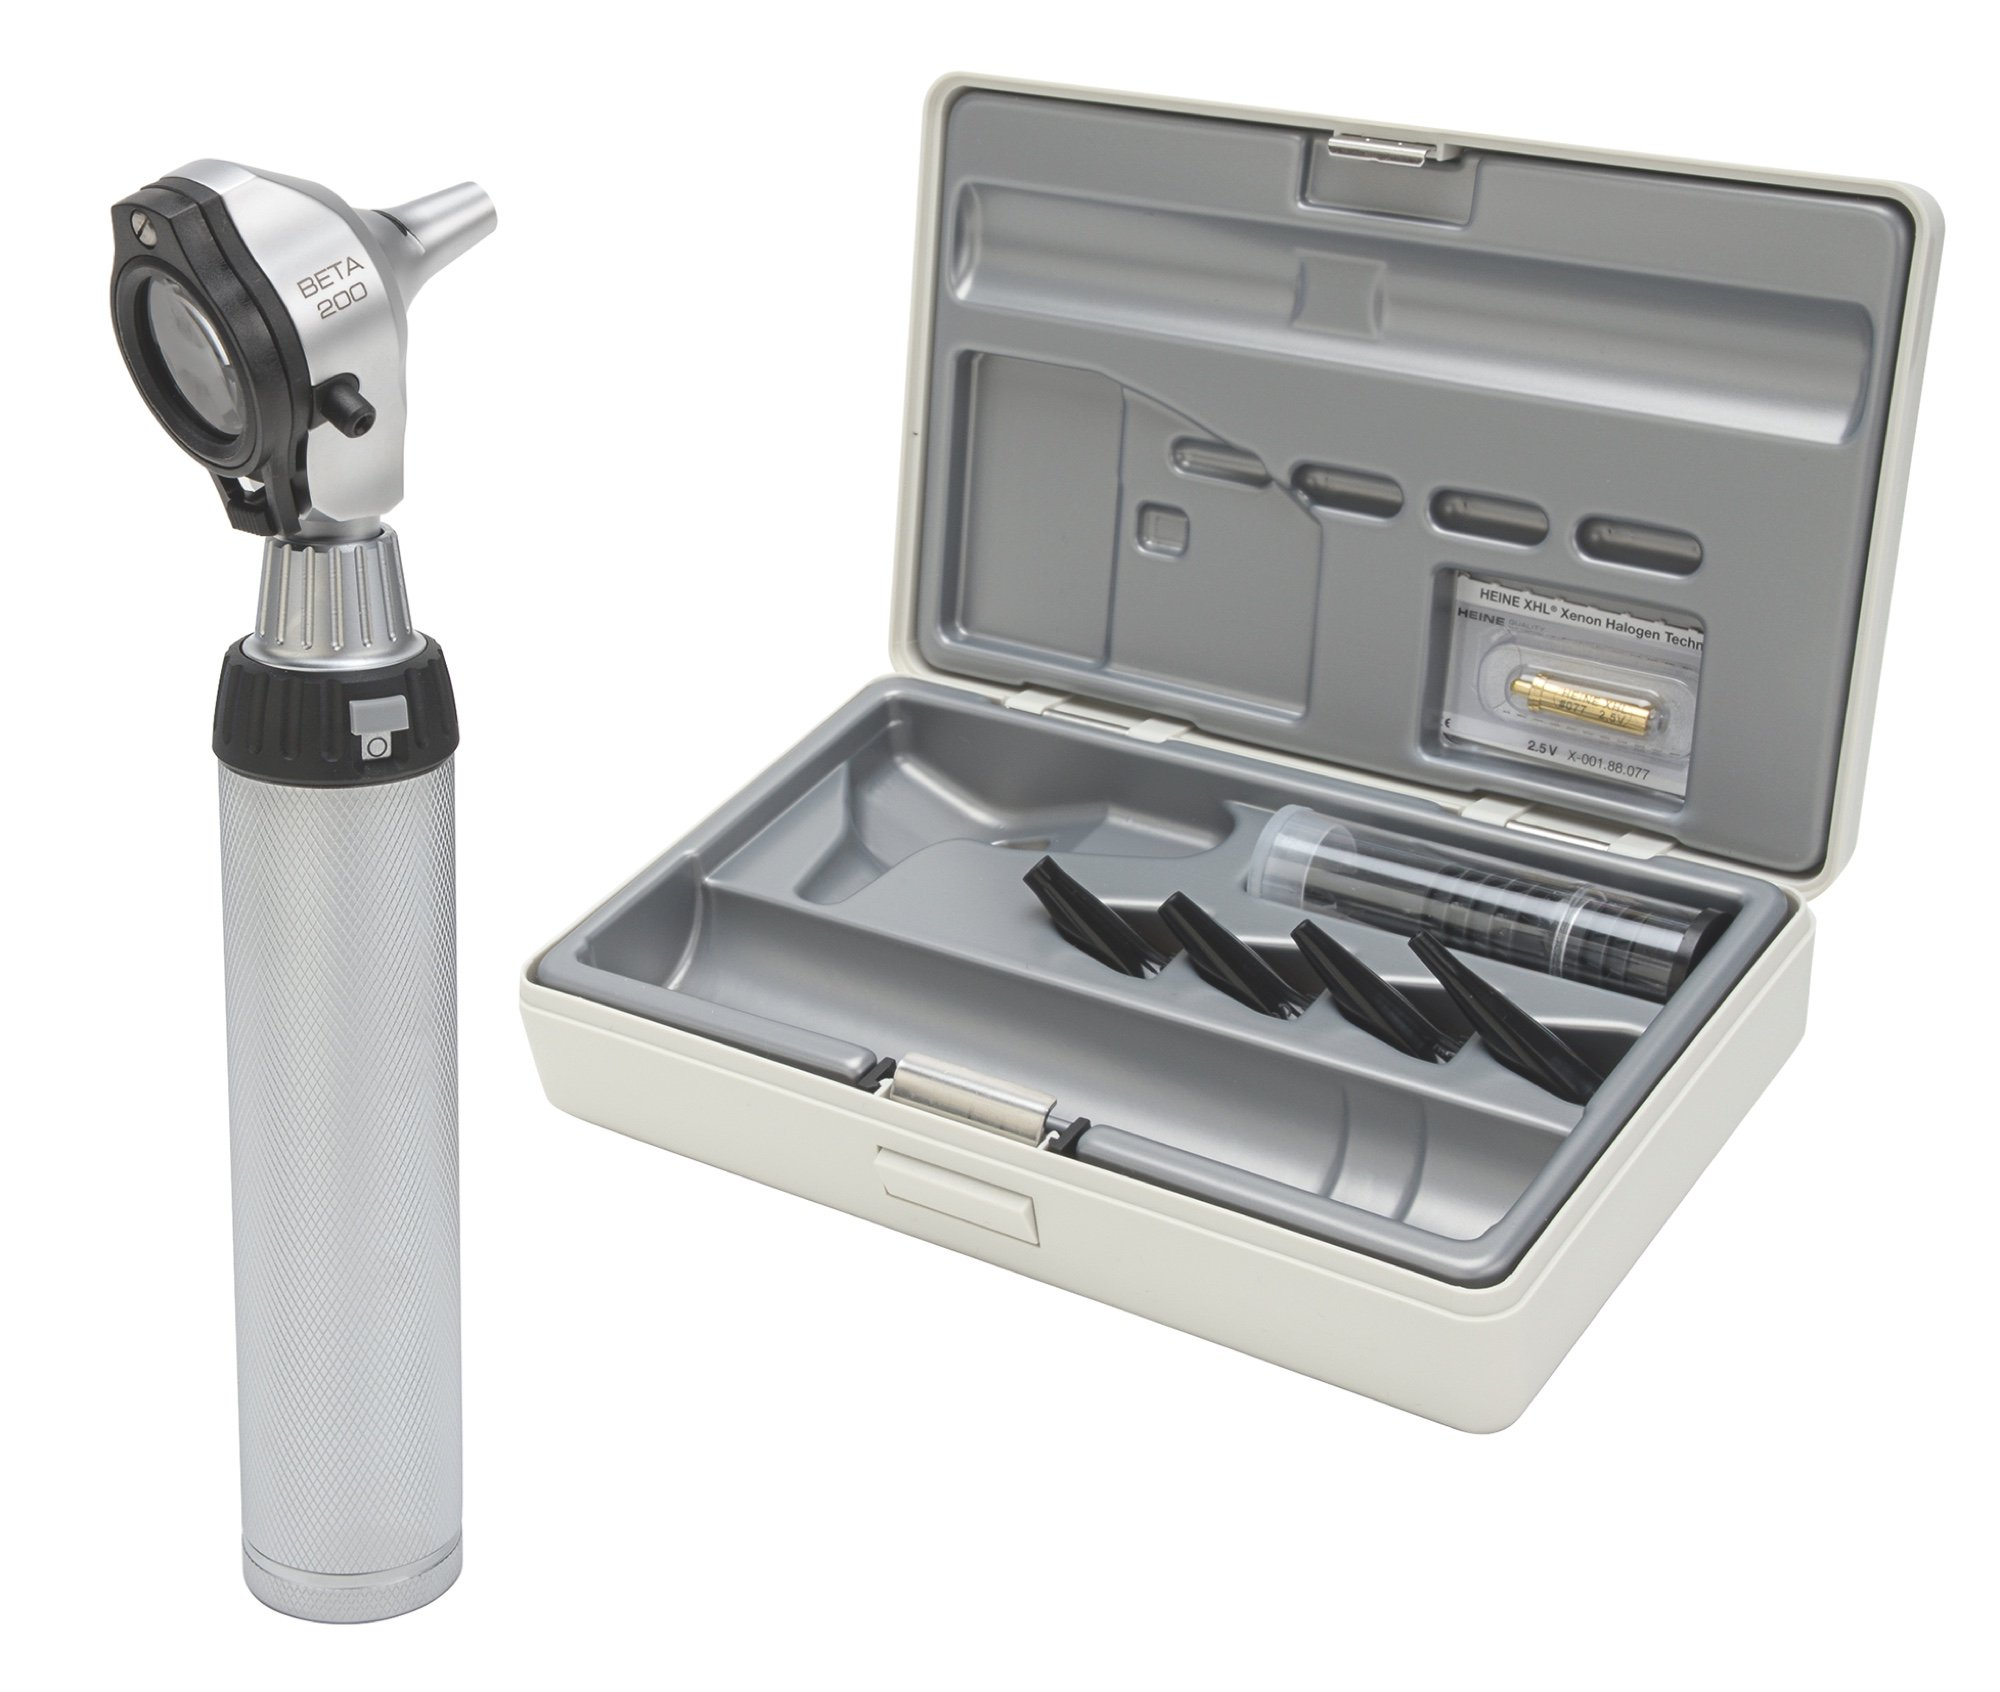 HEINE BETA 200 F.O Otoscope Set with battery handle